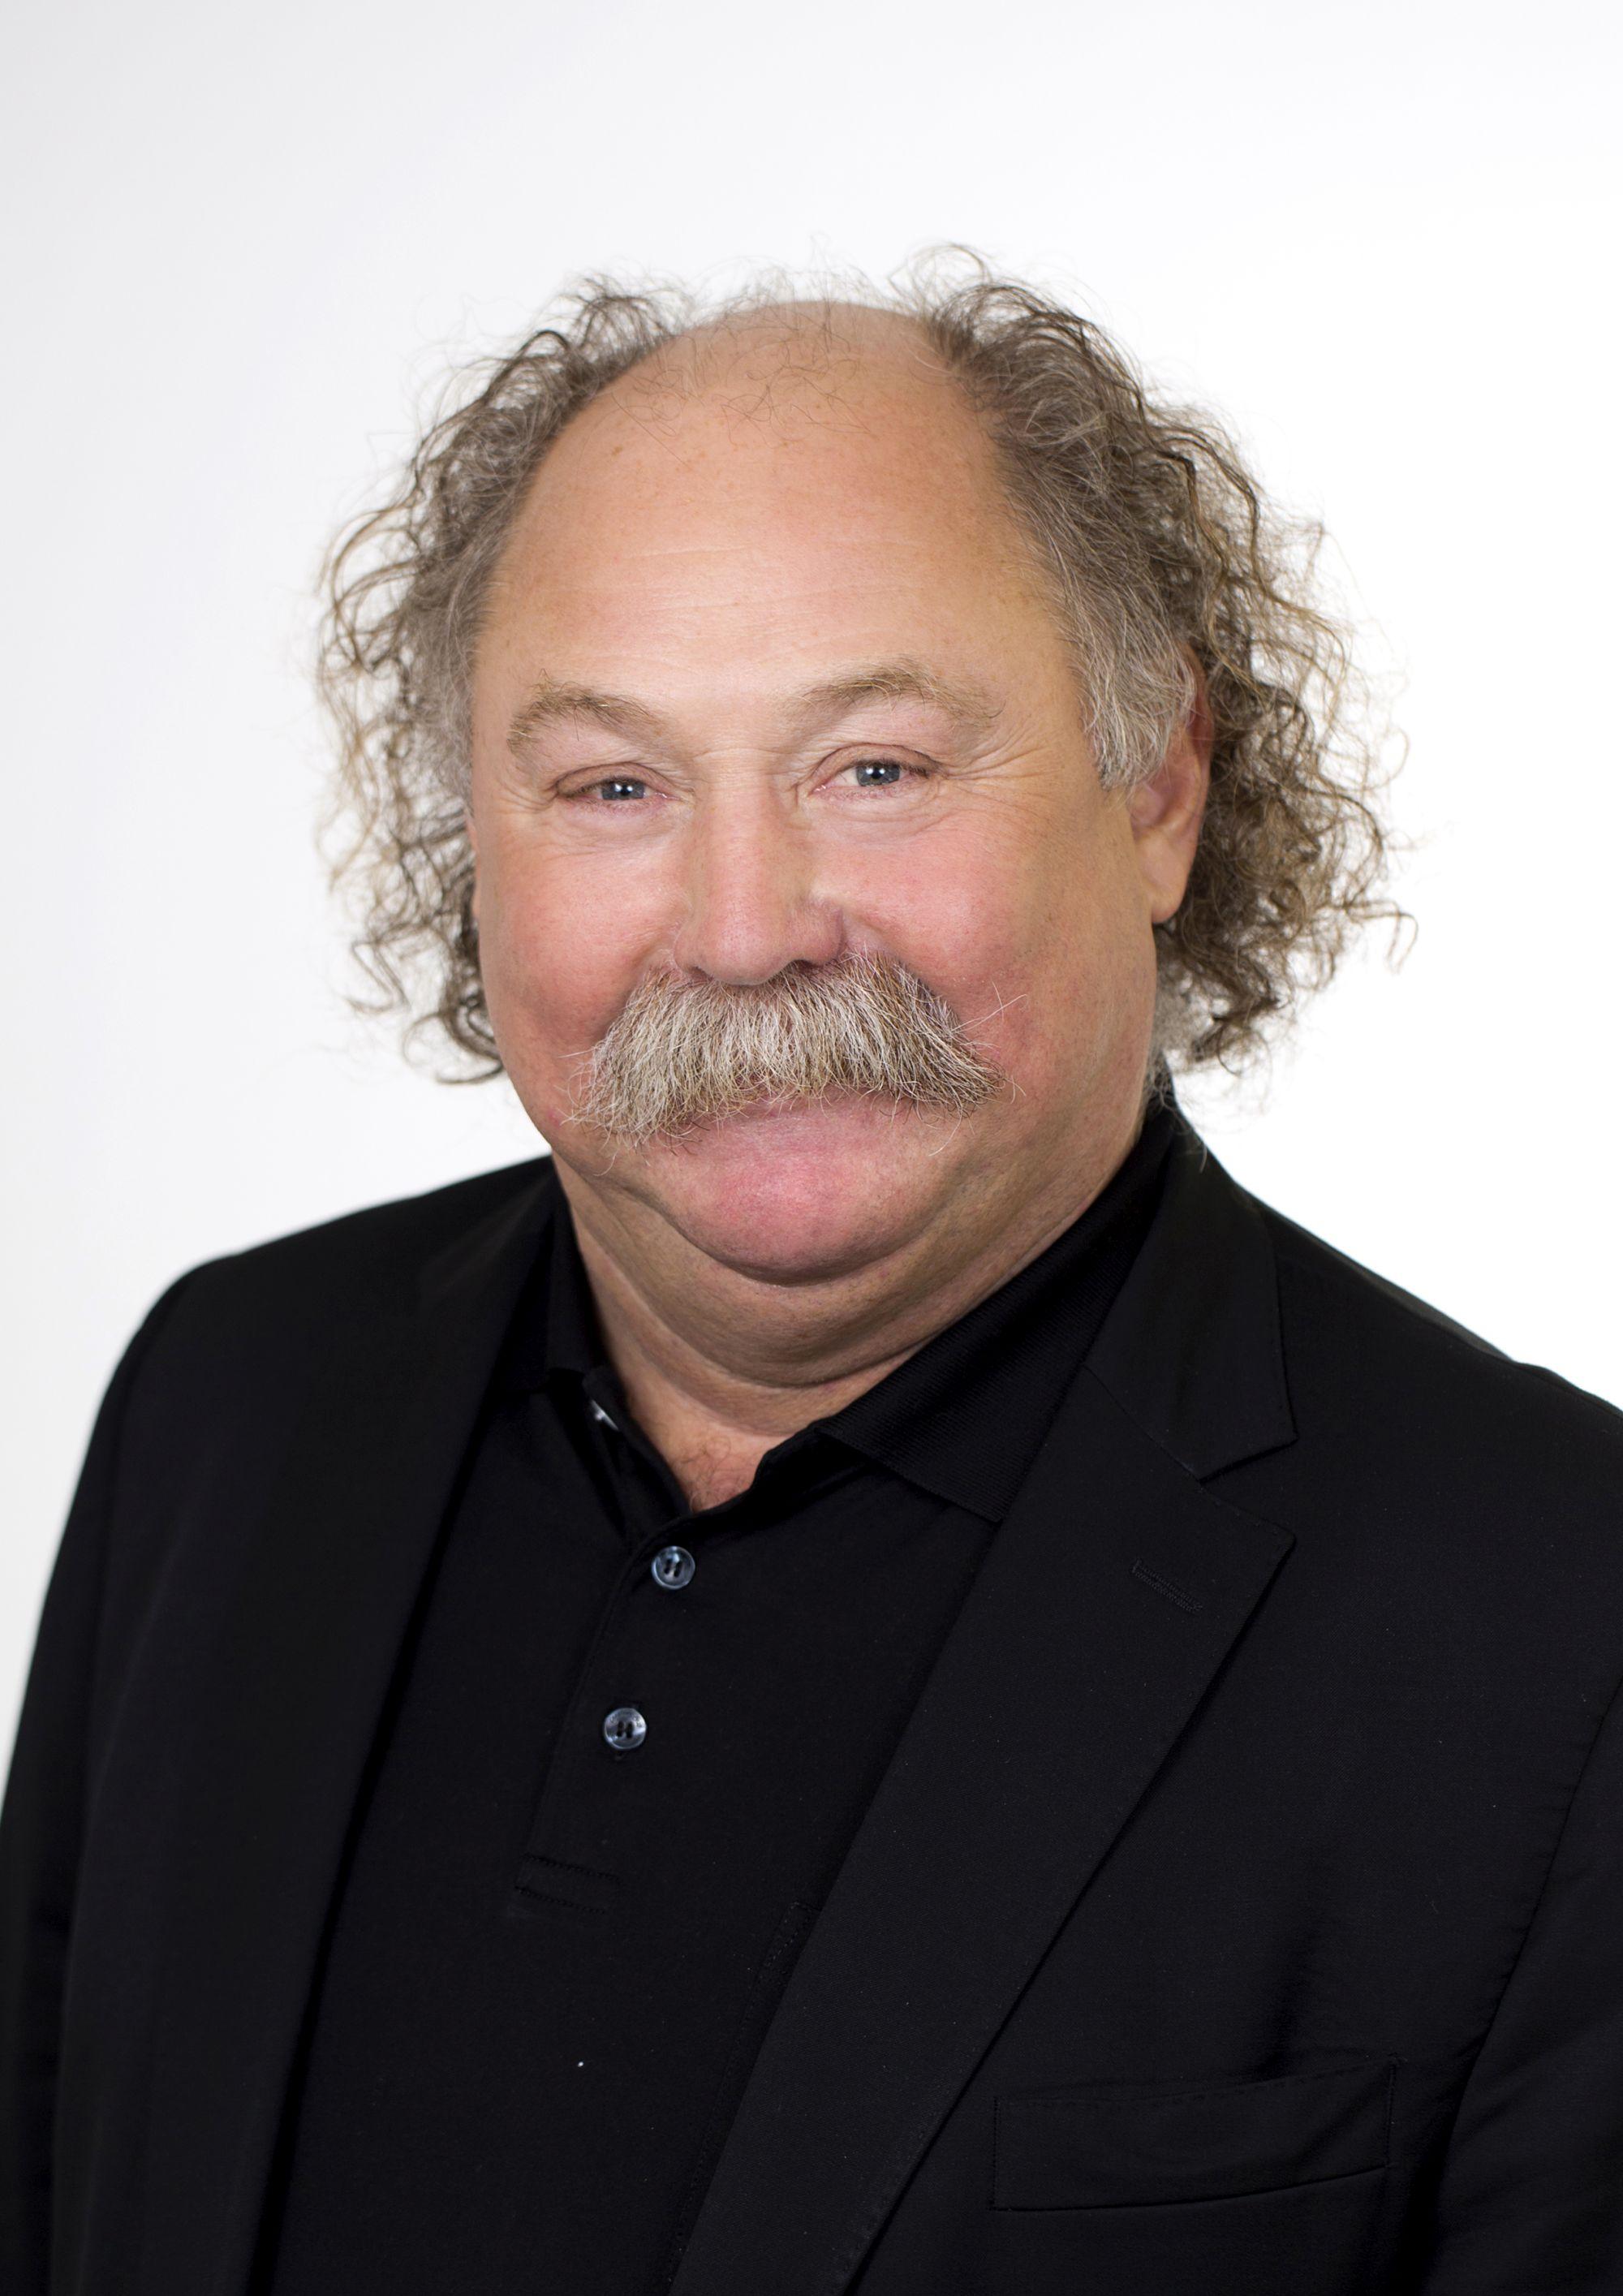 prof dr. michael schäfer